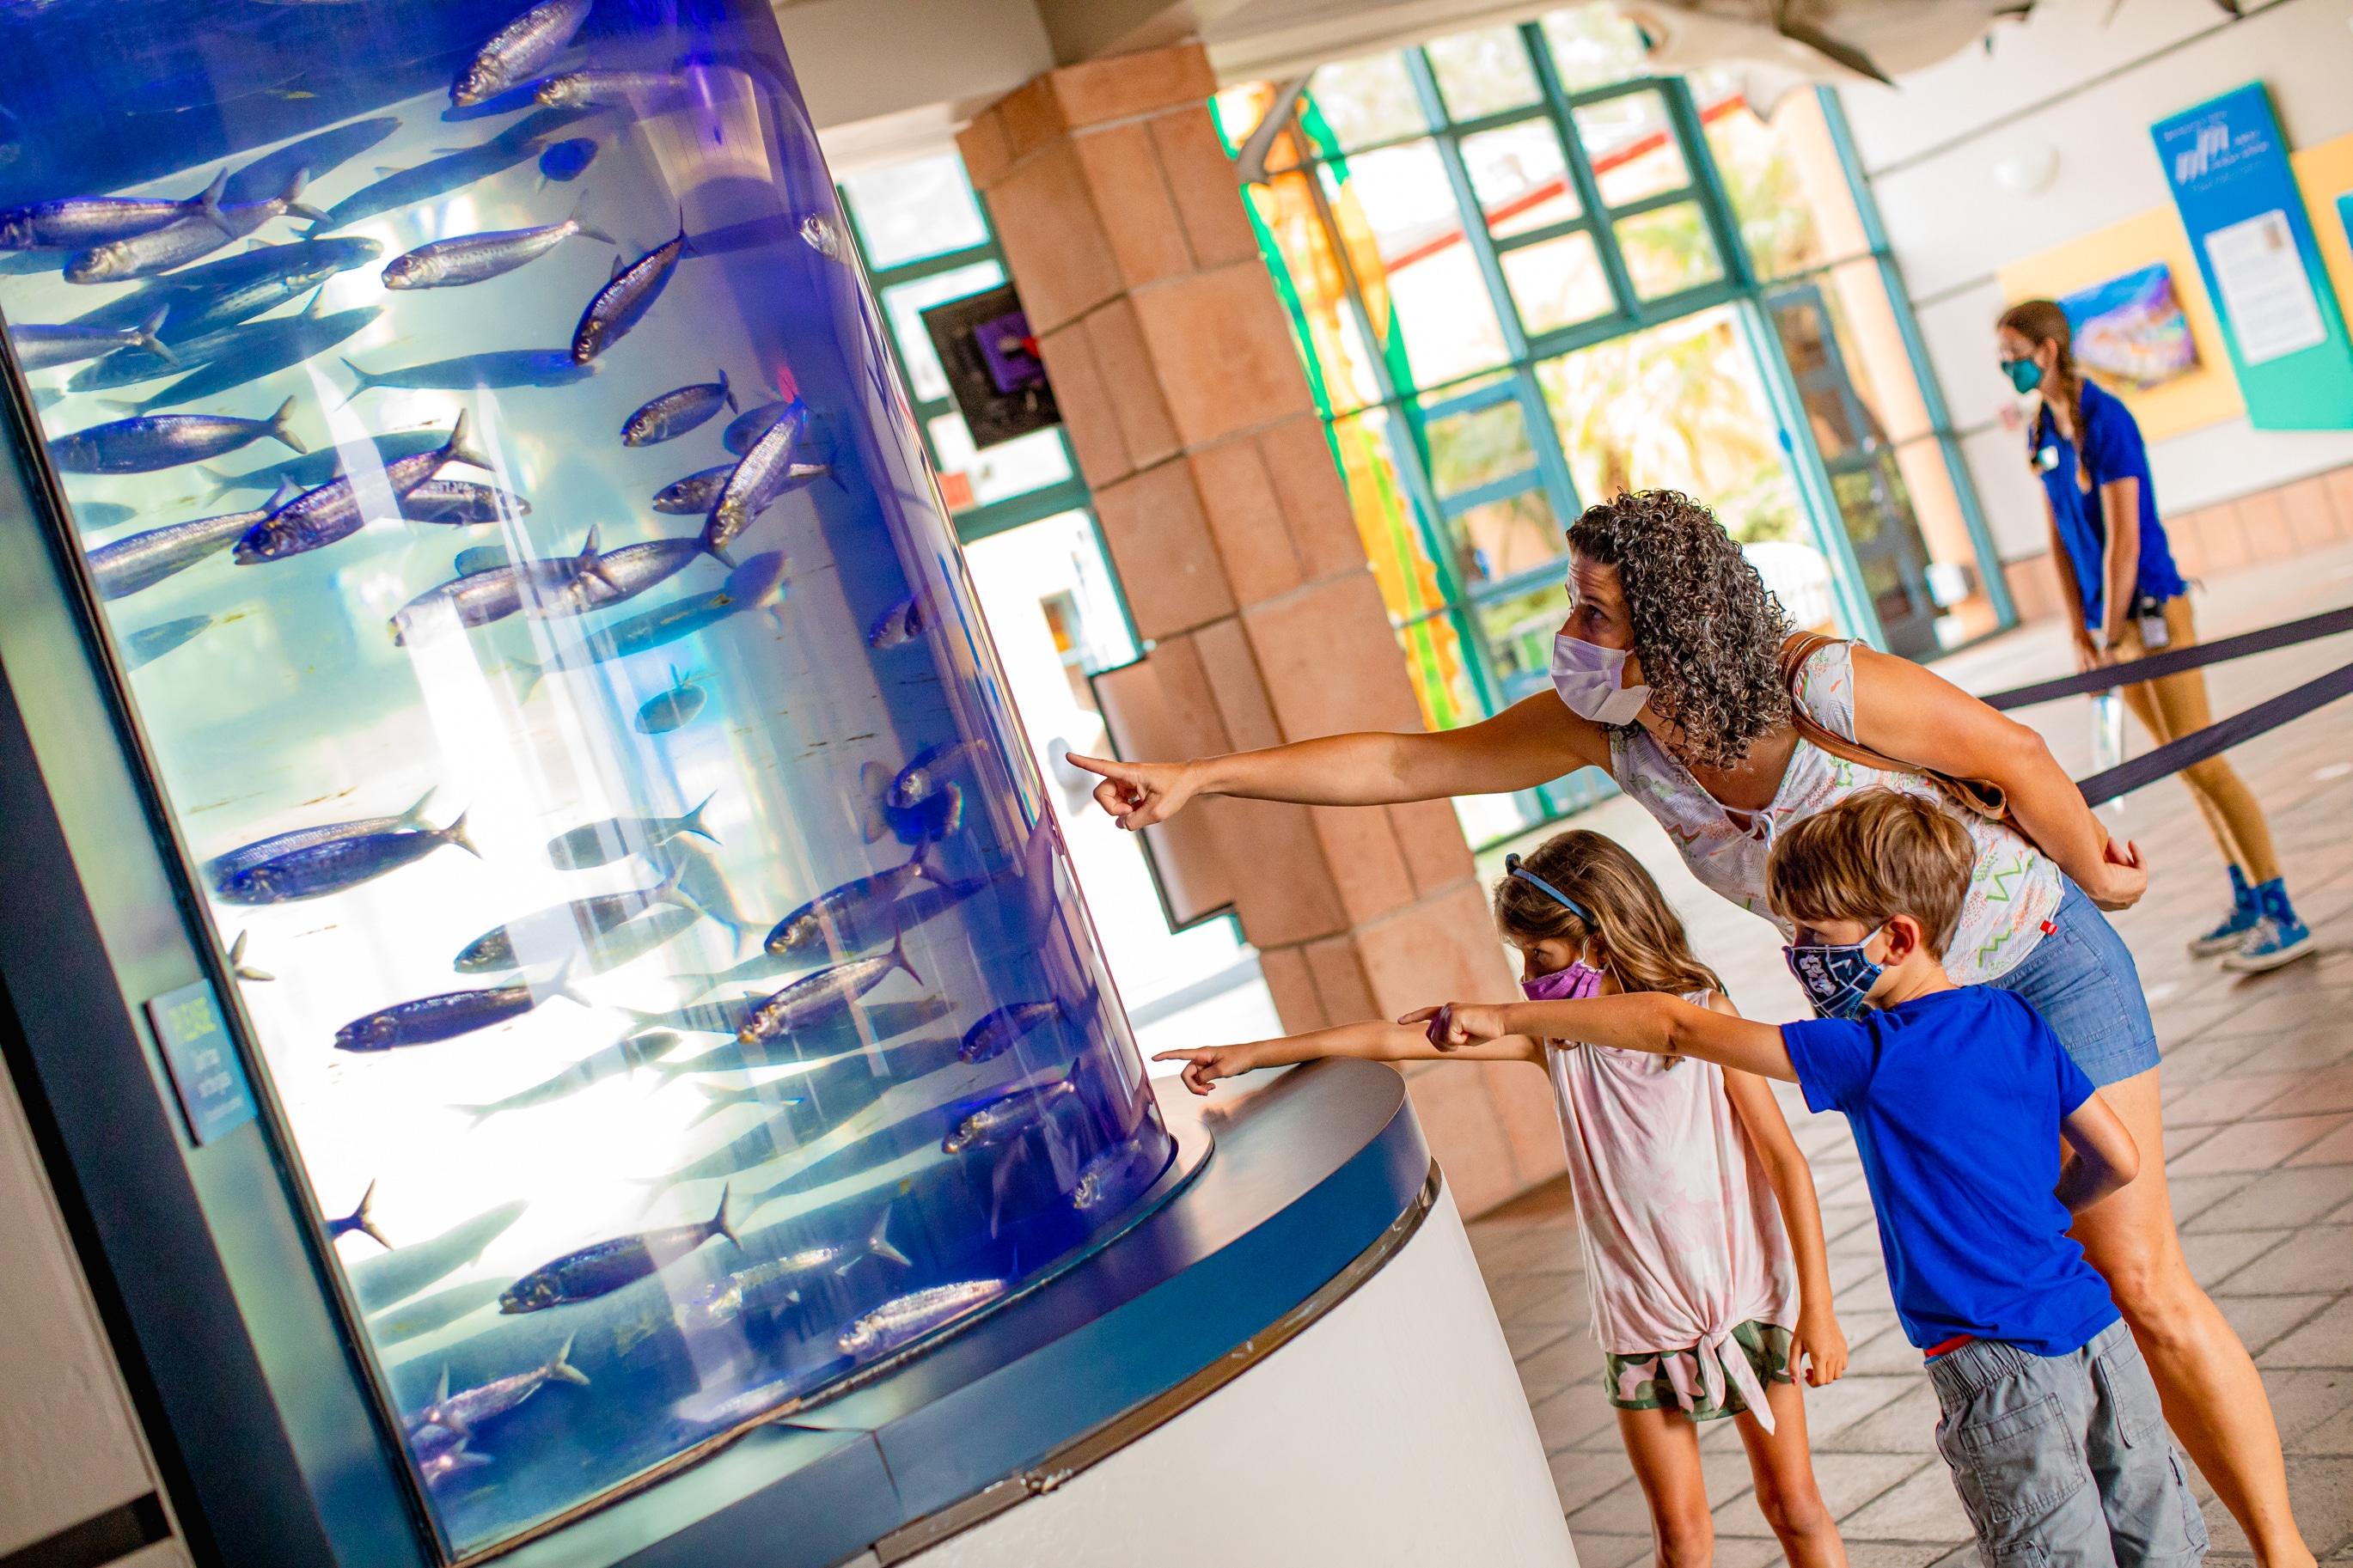 A family wearing masks enjoys a fish tank at Birch Aquarium.